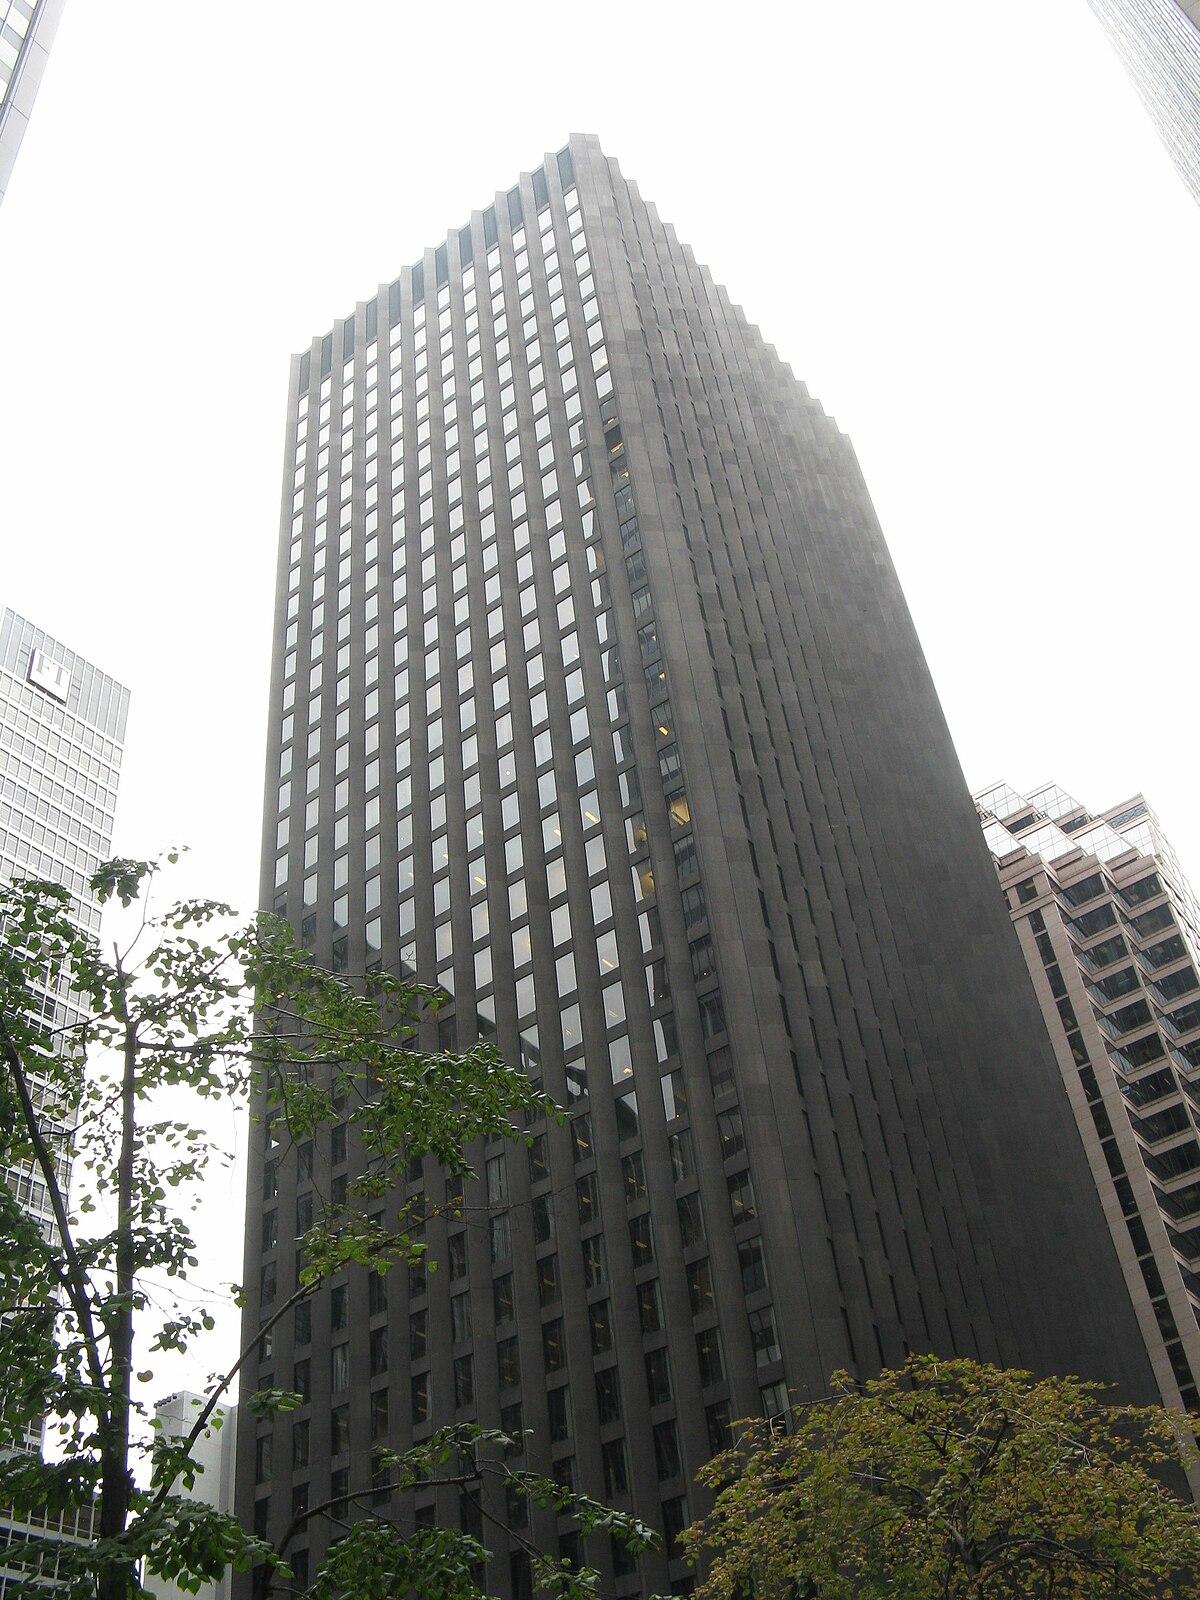 CBS Corporation - Wikipedia